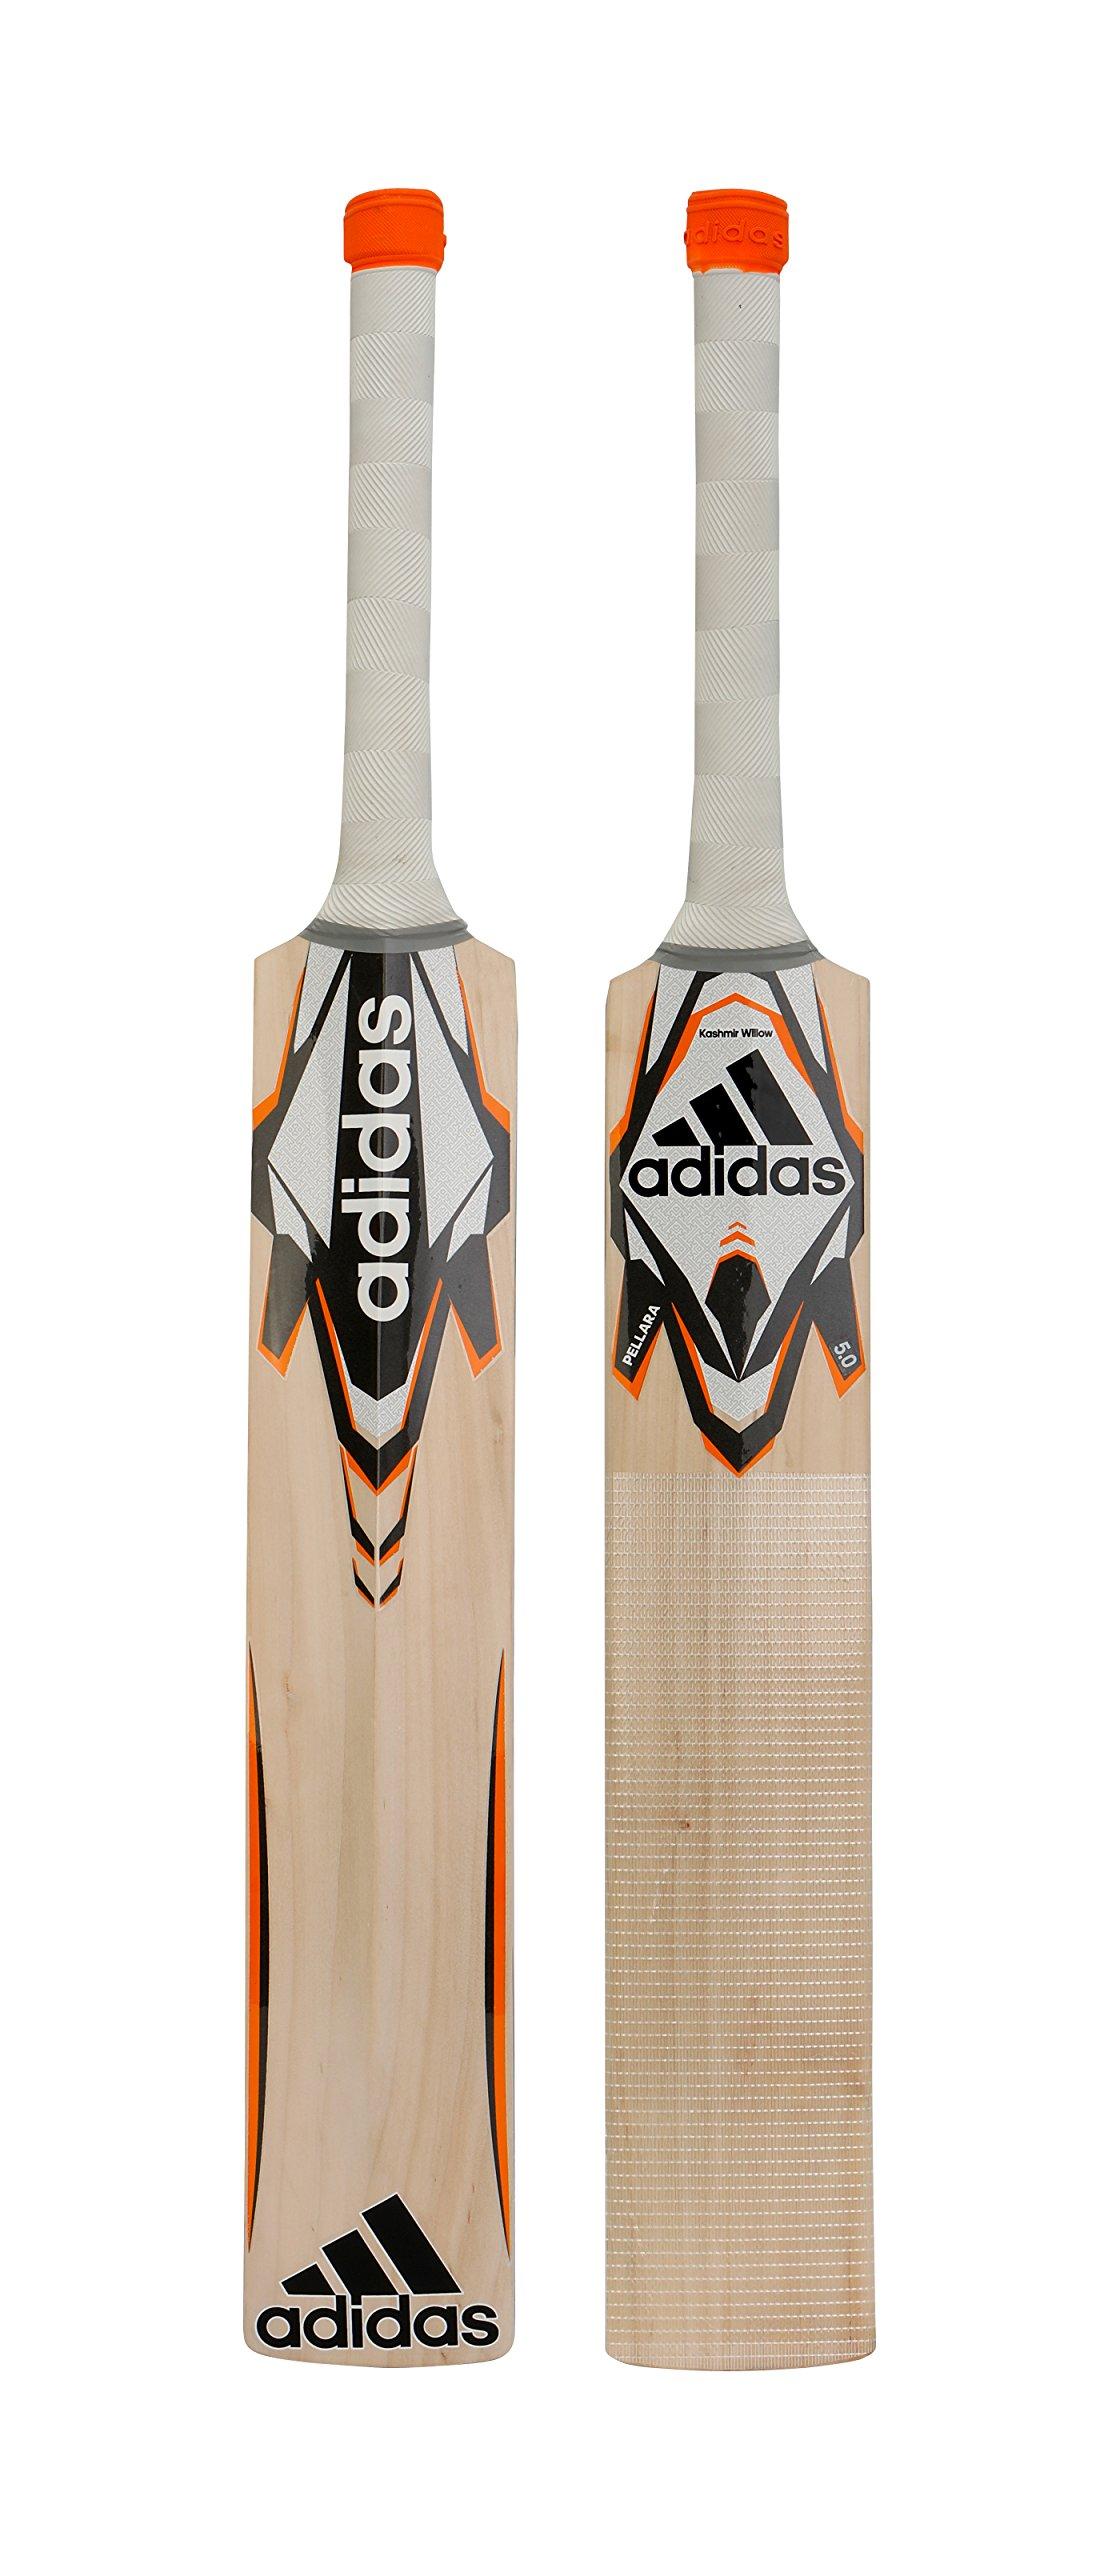 Amazon price history for Adidas Pellara 5.0 Kashmir-Willow Short Handle Cricket Bat